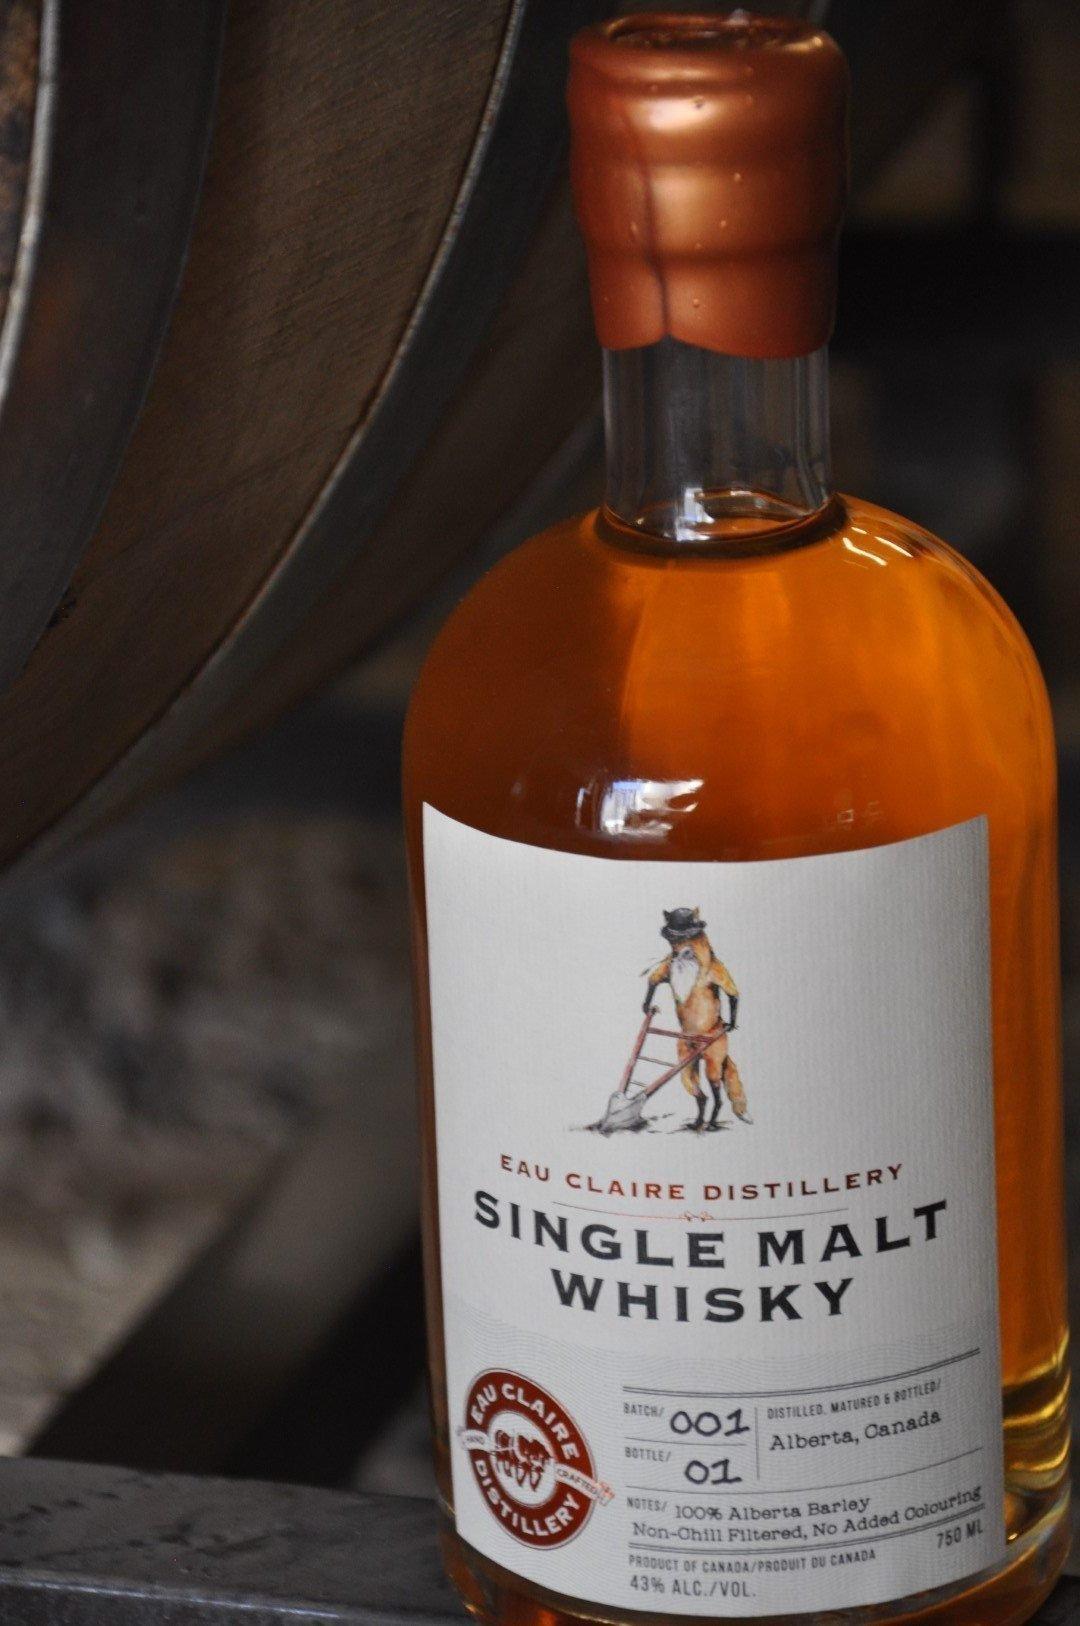 Eau Claire Distillery Single Malt Whiskey